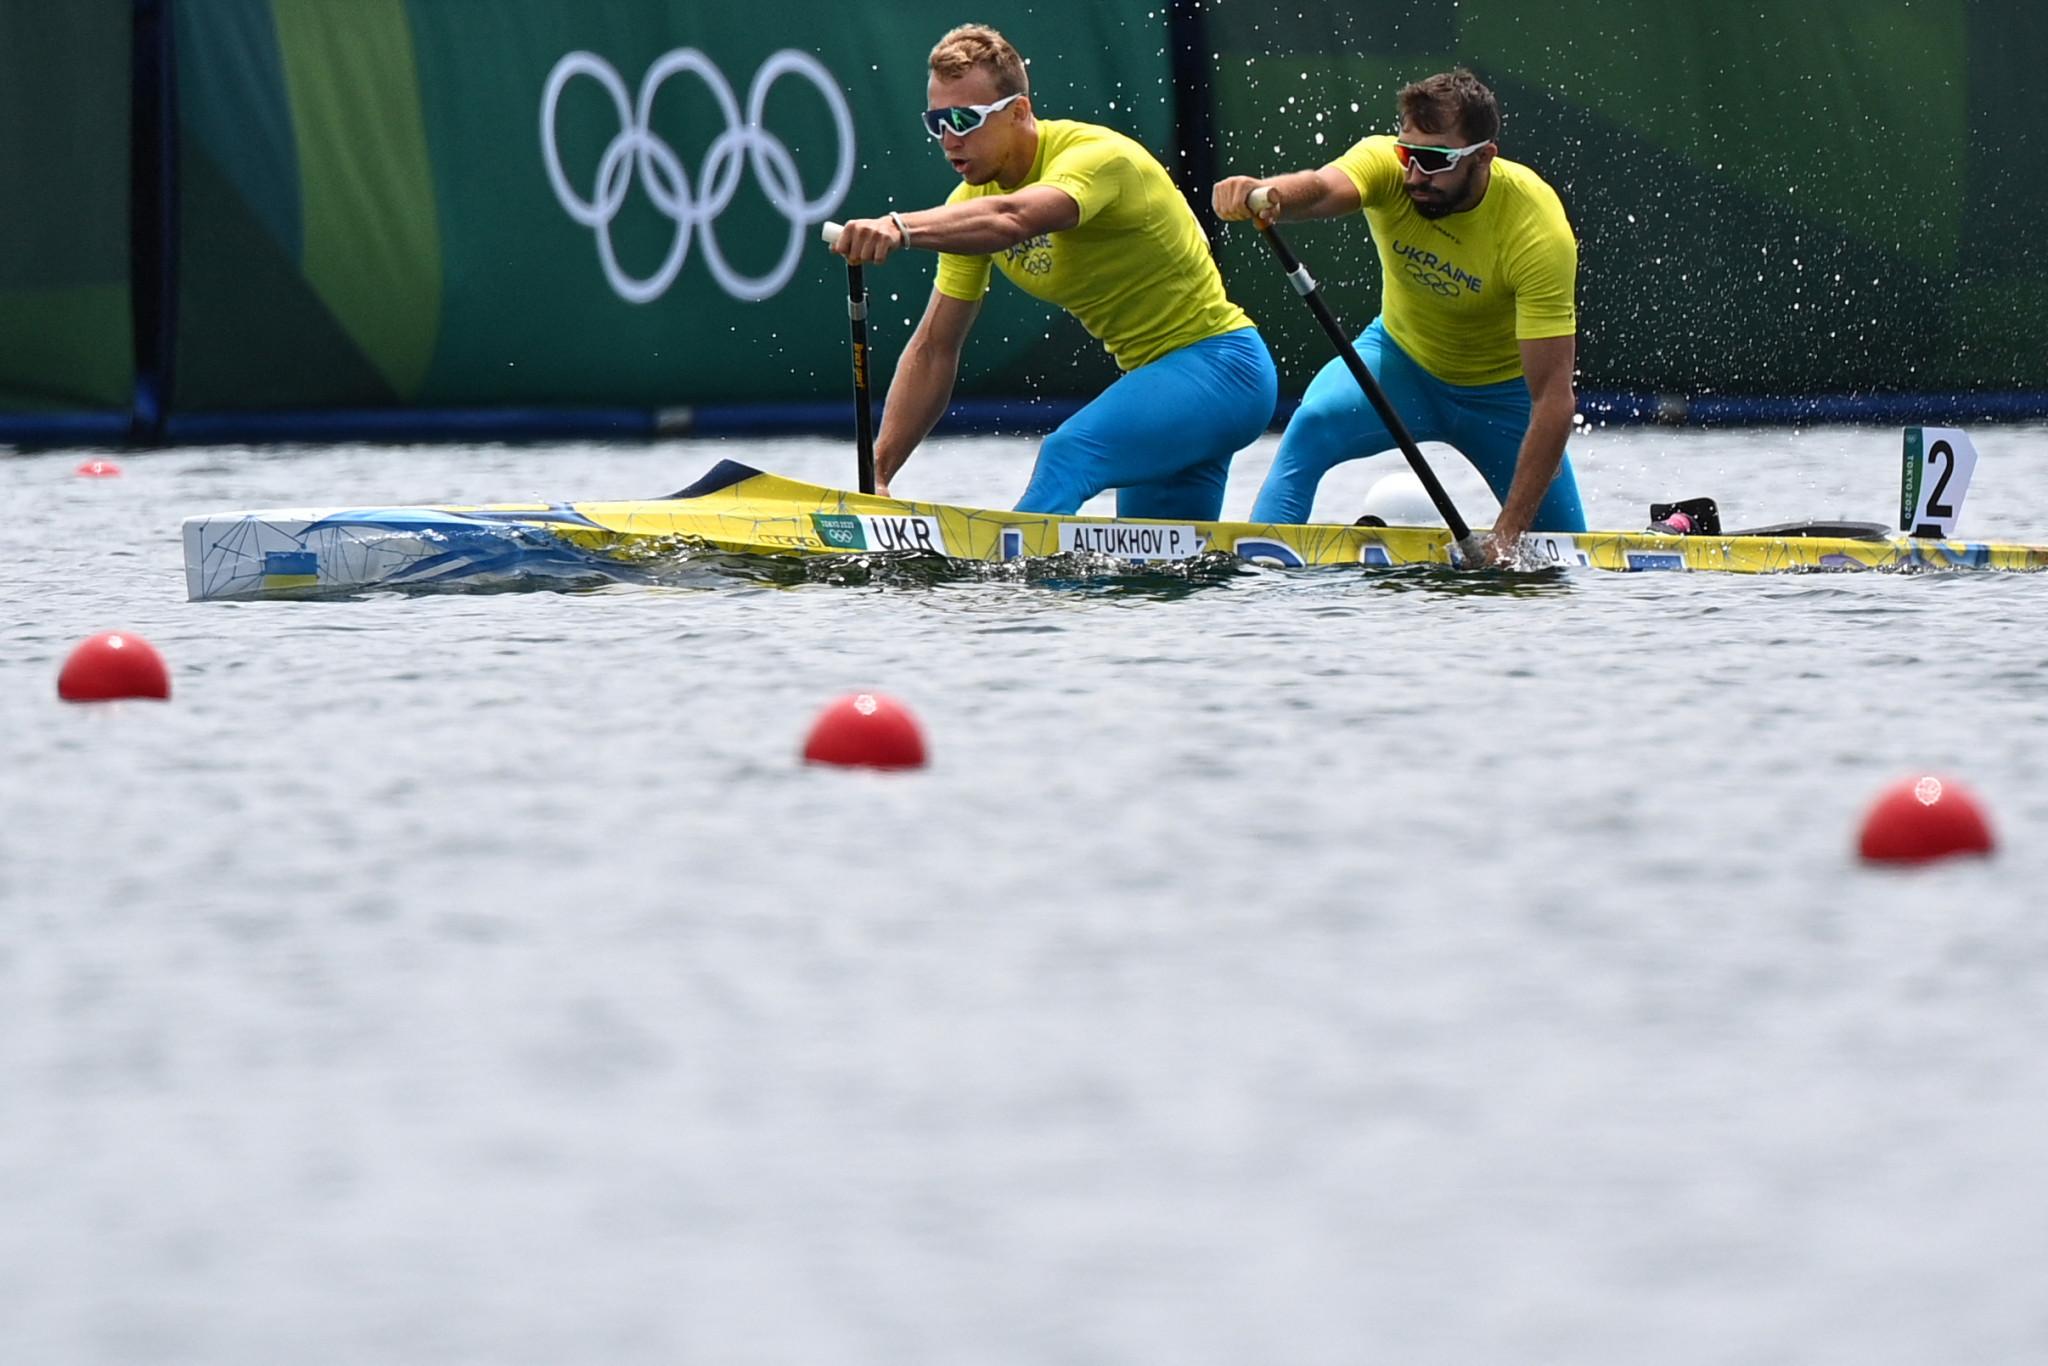 Ukraine wins fours titles at ICF Canoe Sprint World Championships